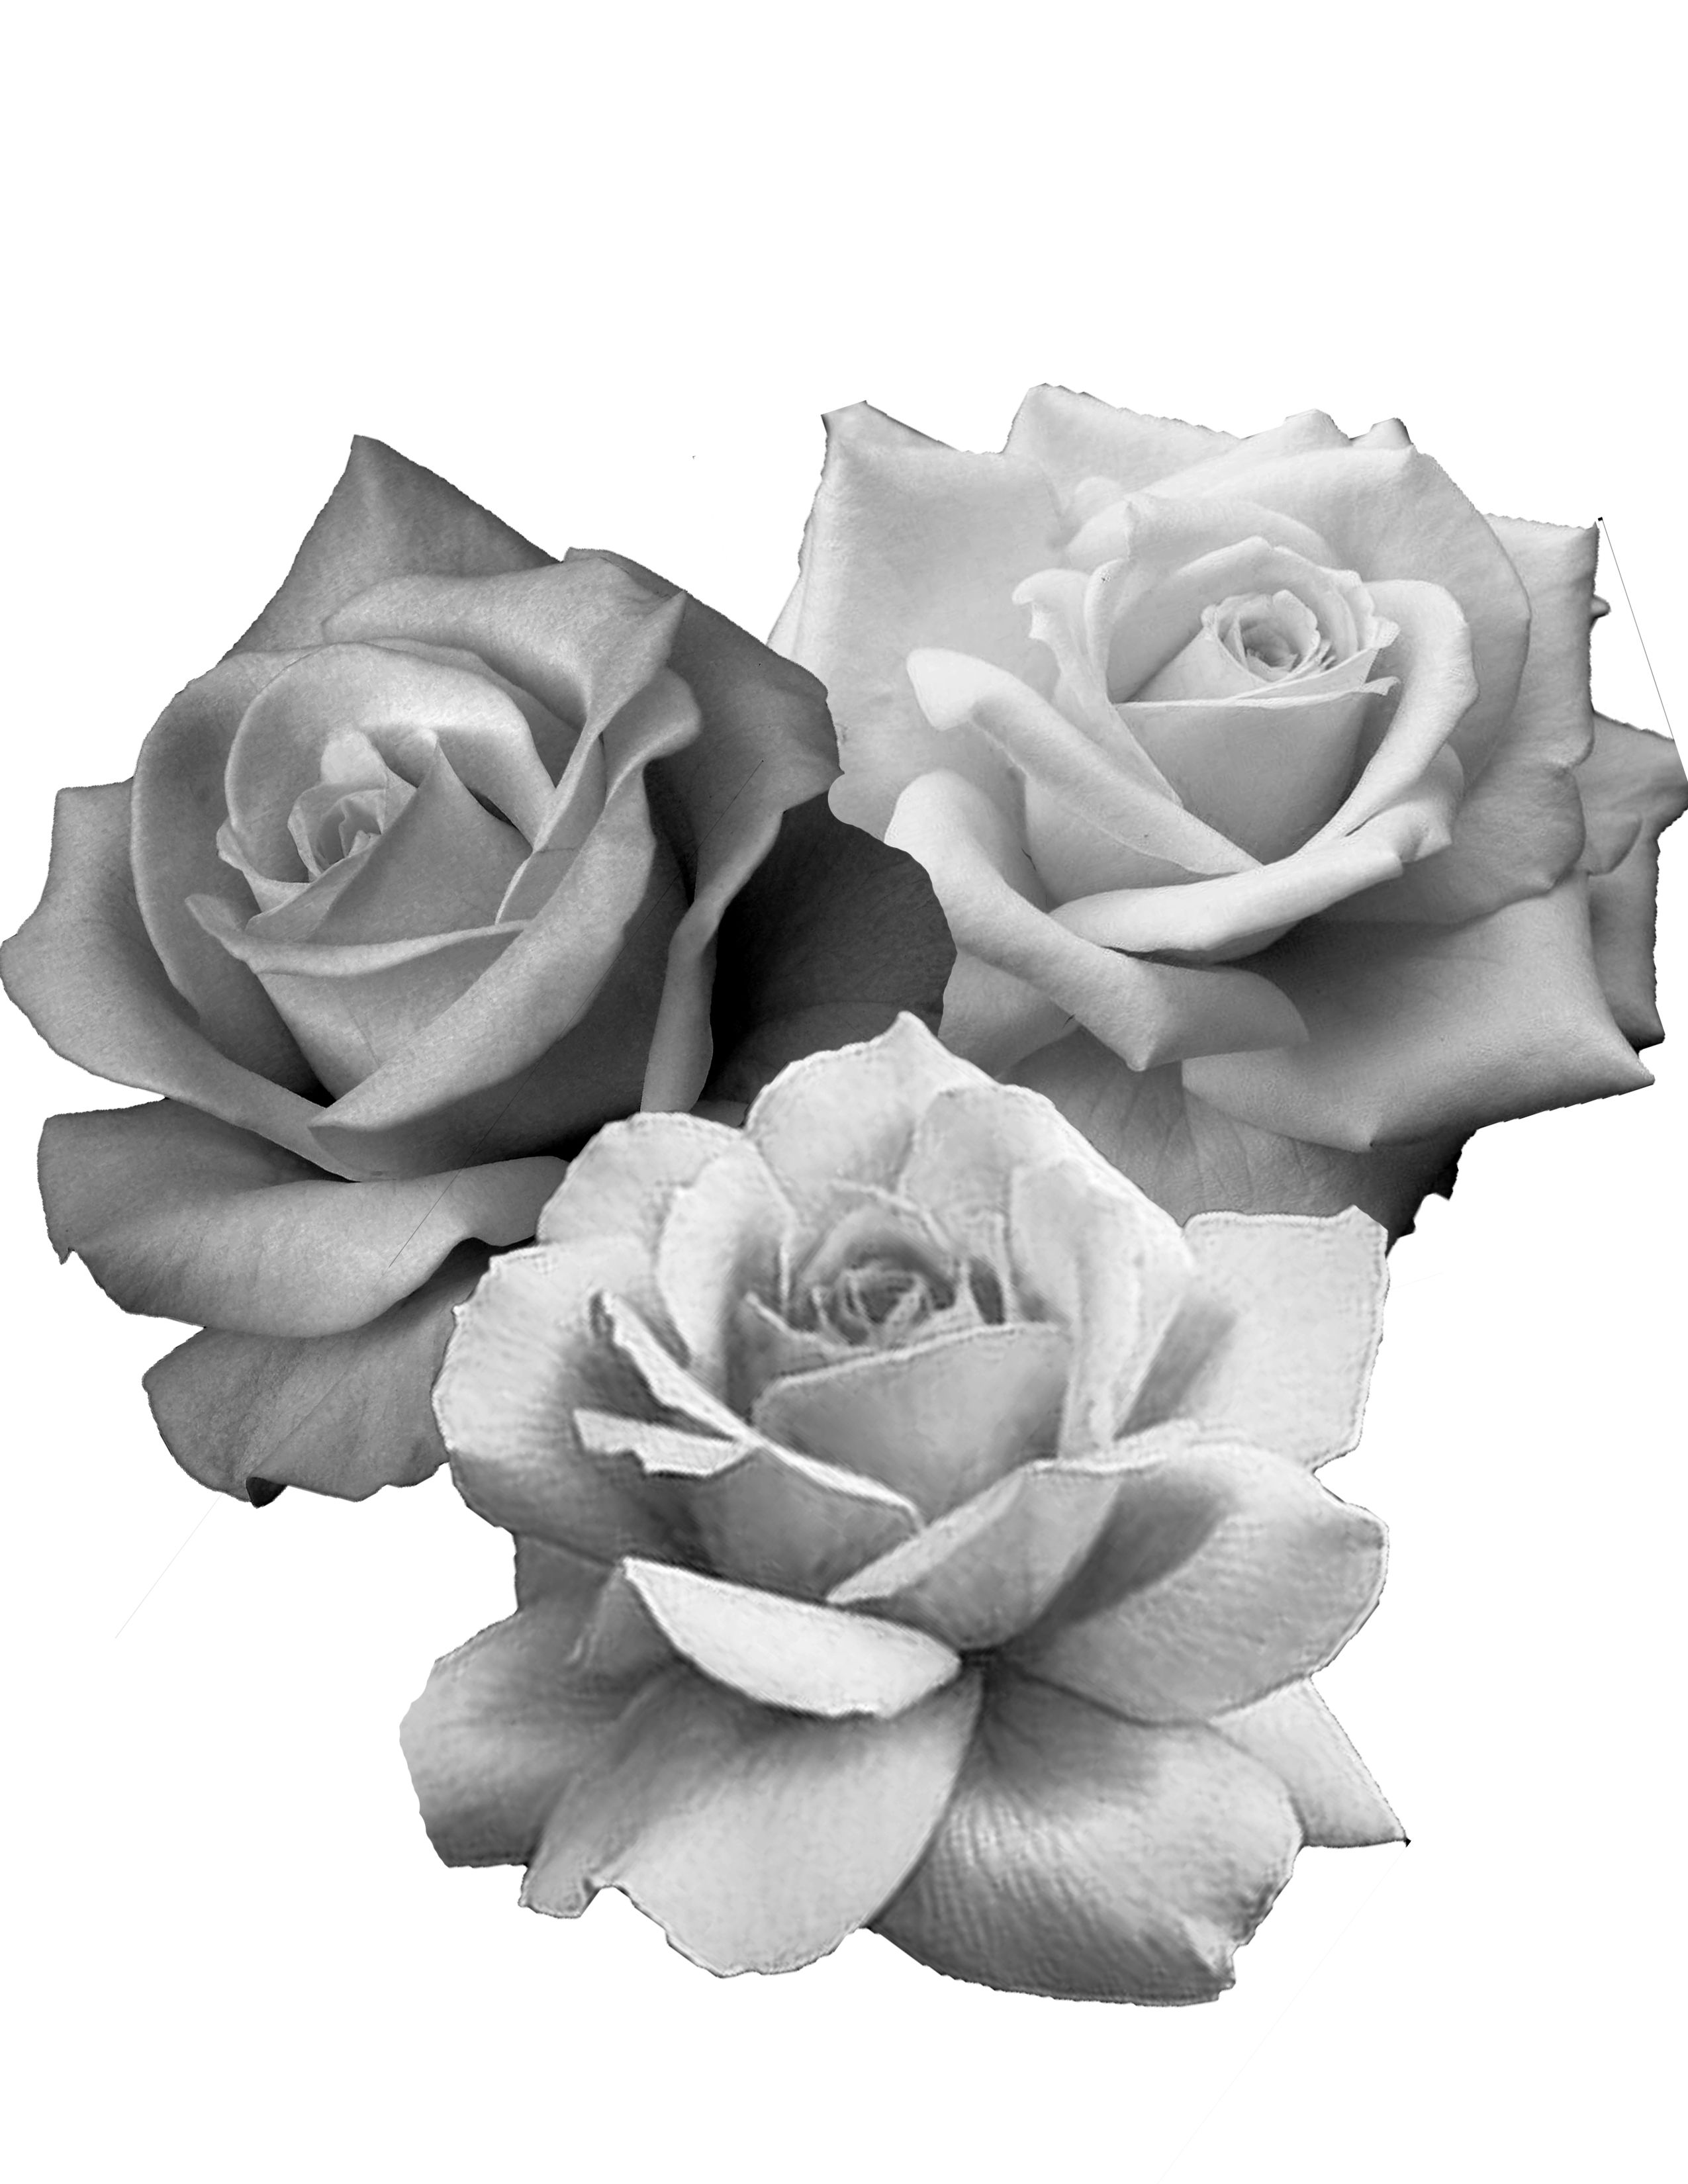 Pin by emmanuel on tattoo ideas pinterest dessin rose tatouage and rose - Dessin de rose ...